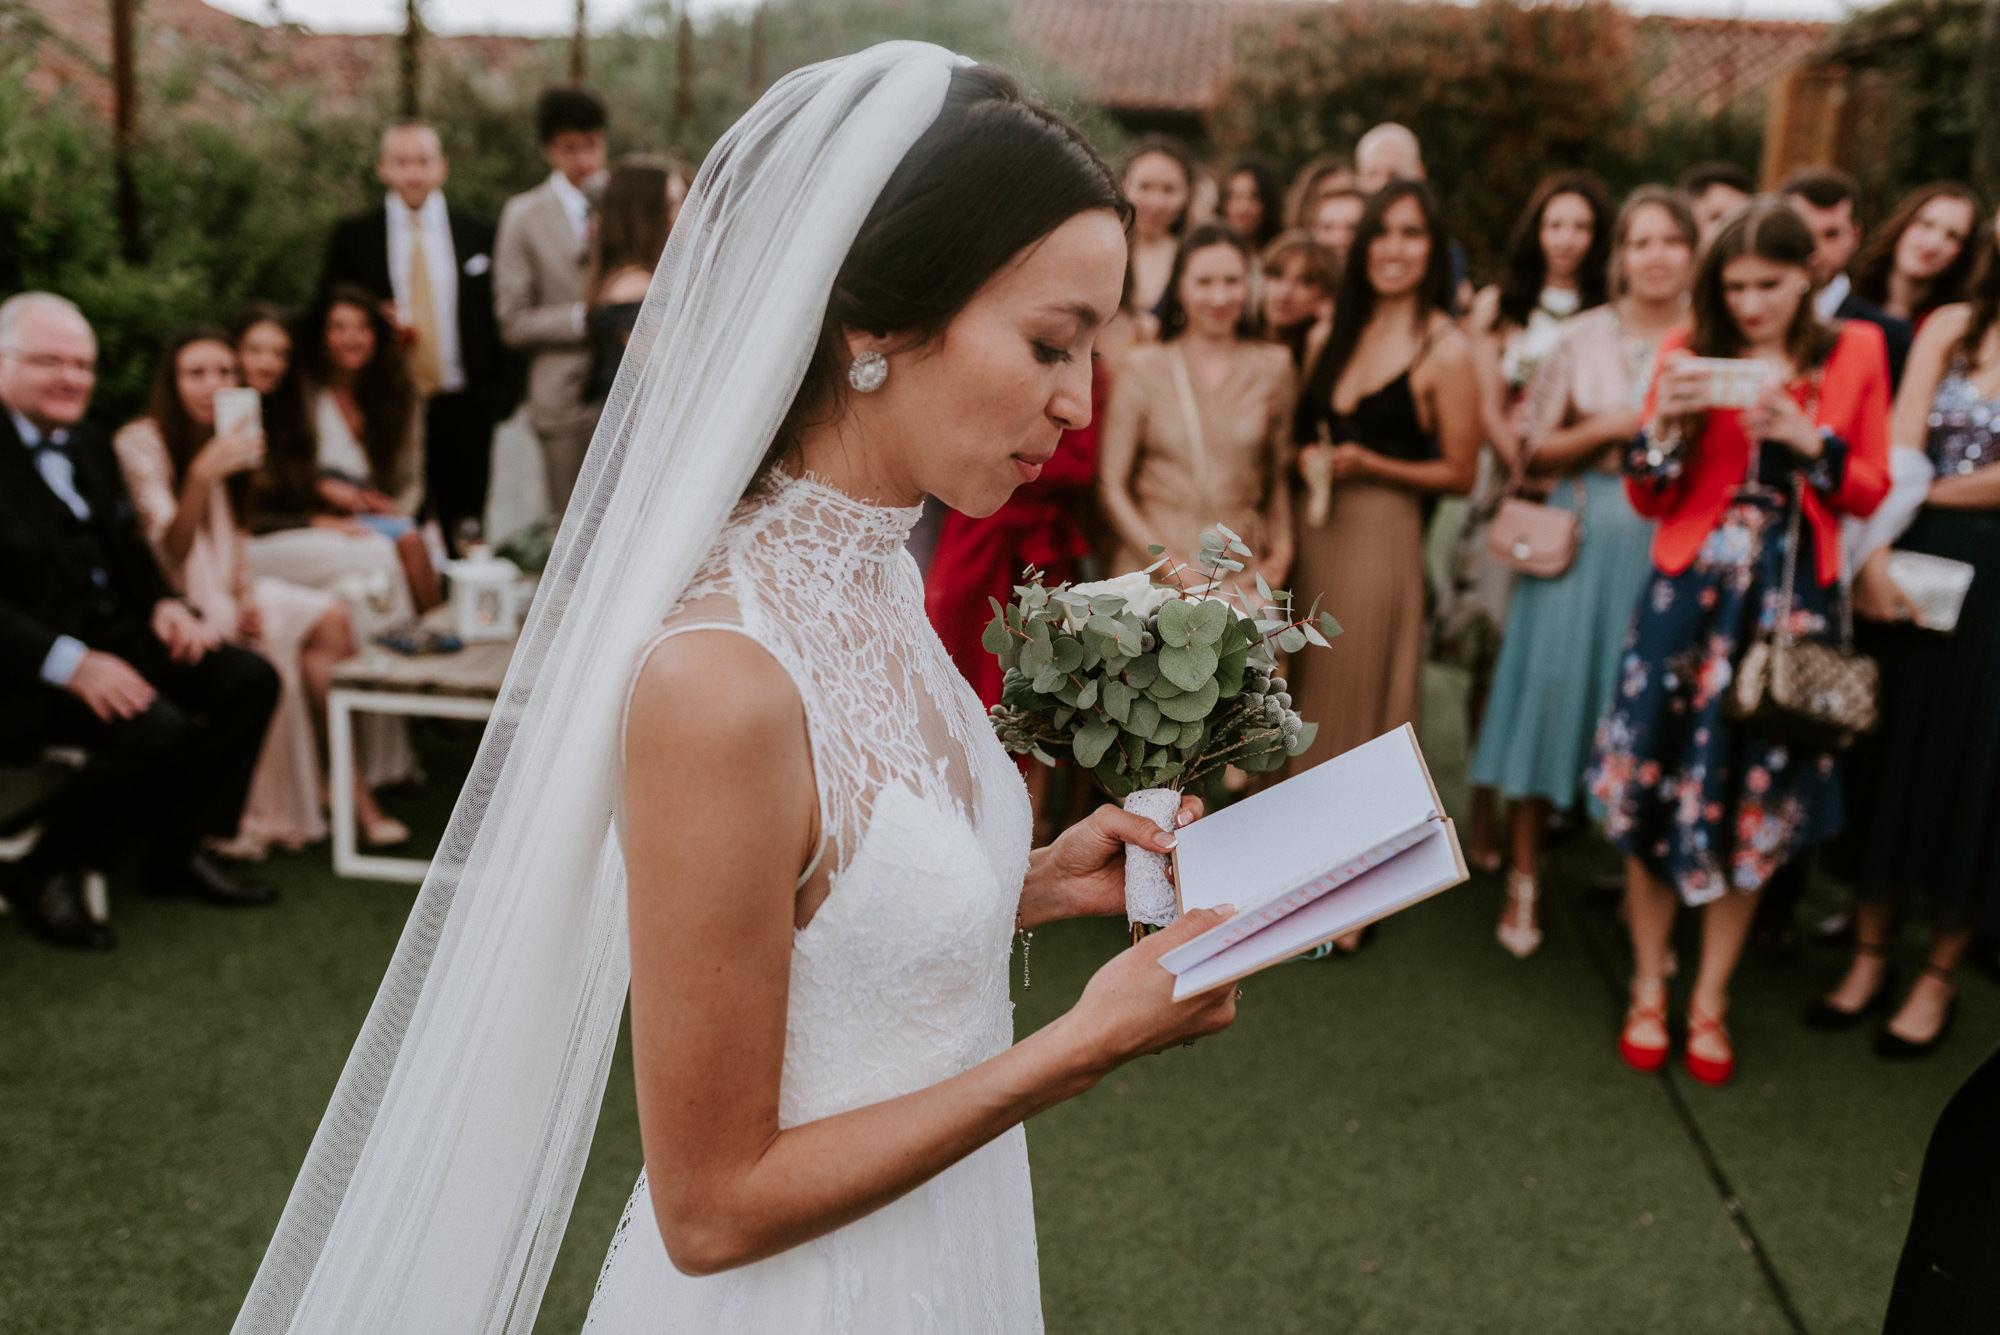 FOTO+PHOTO+BODA+WEDDING+ITALIA+ITALY+MAURICIO+GARAY+MAURICIOGARAY+WEDDINPHOTOGRAPHER+FOTOGRAFODEBODA-1445.jpg